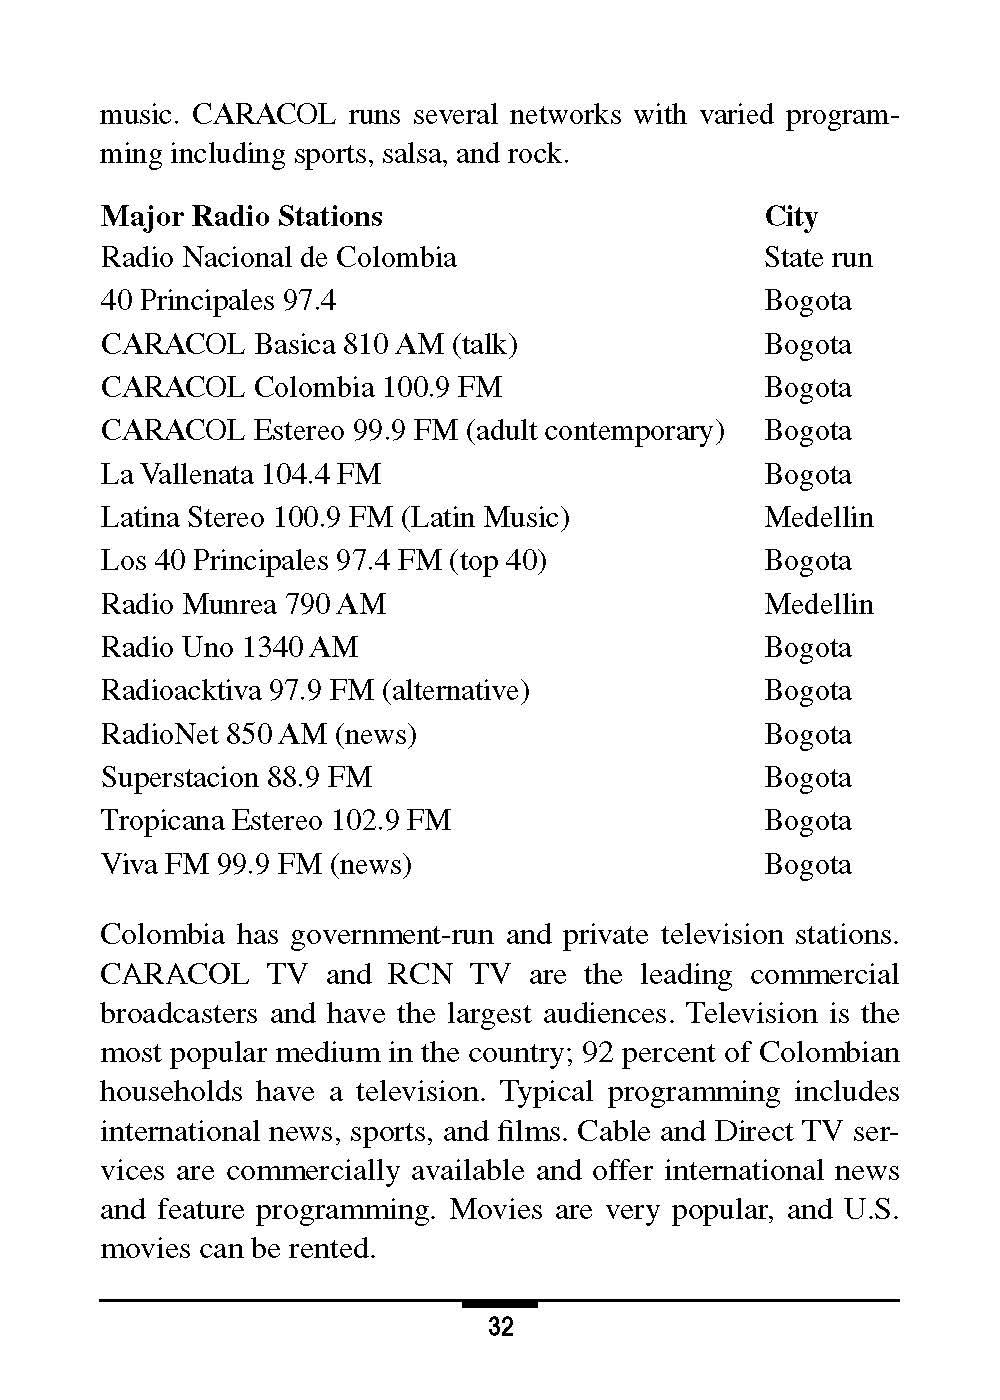 MCIA-ColombiaHandbook_Page_044